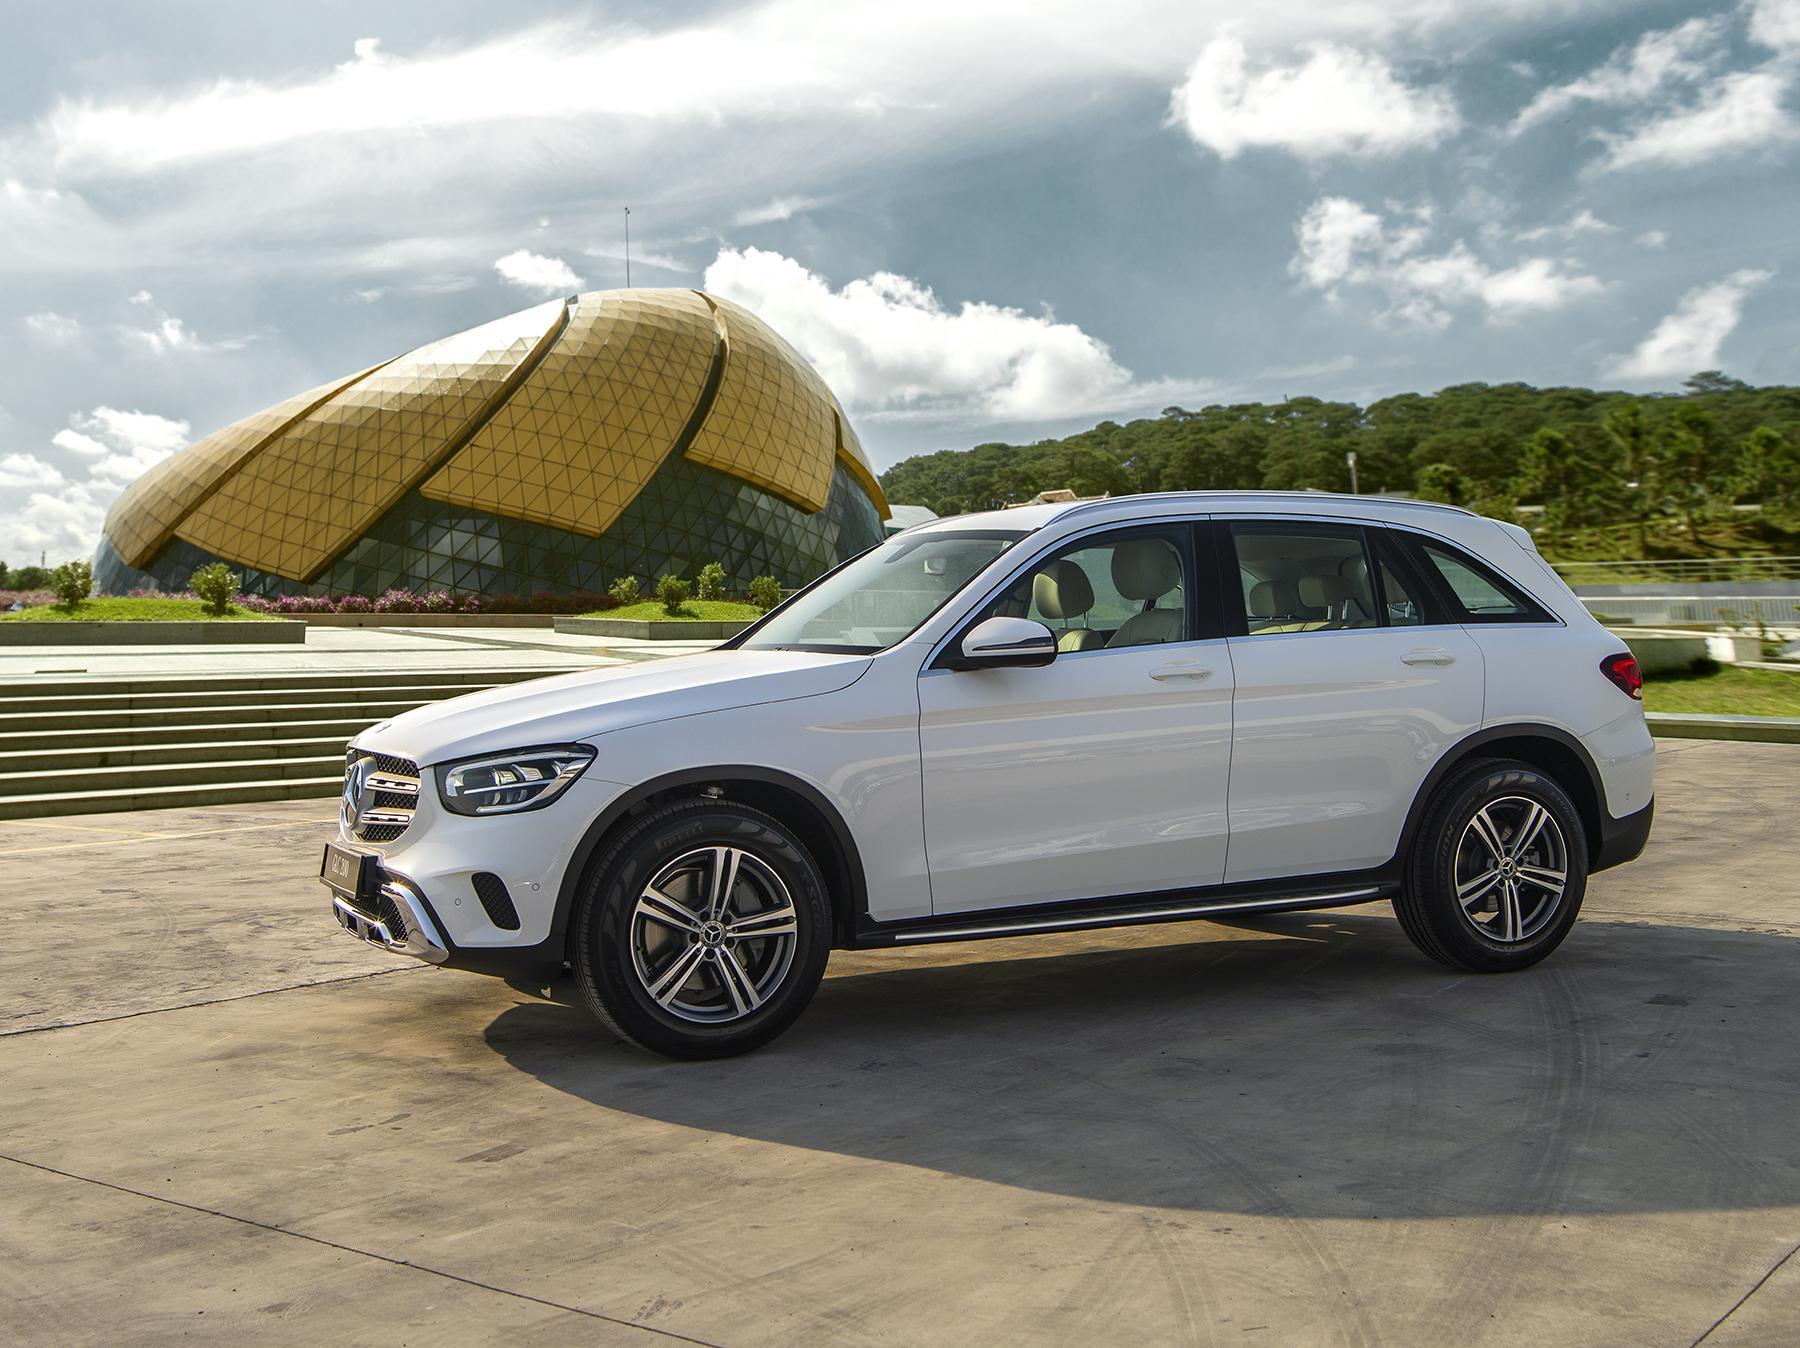 Mercedes-Benz GLC 200 2020 (2)